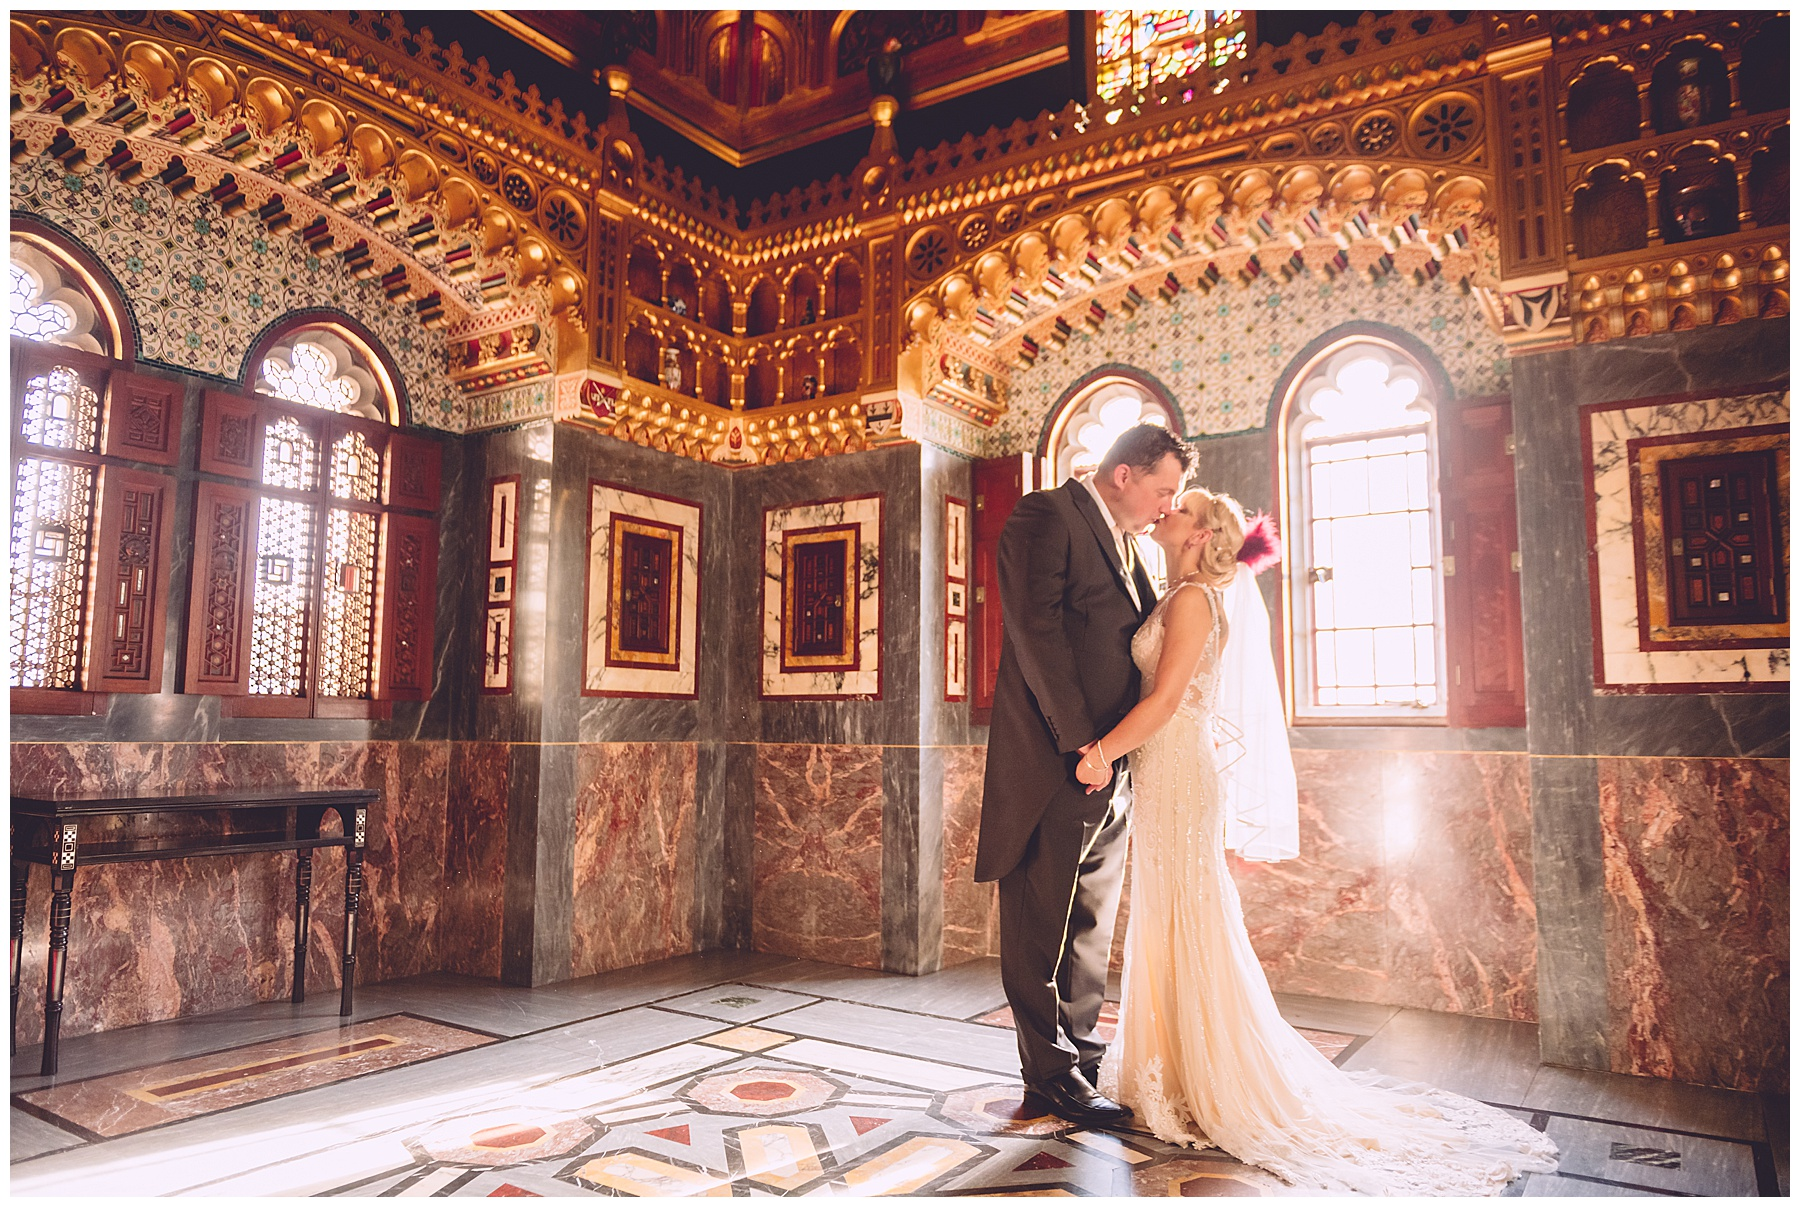 Bride & Groom in Arab Room at Cardiff Castle